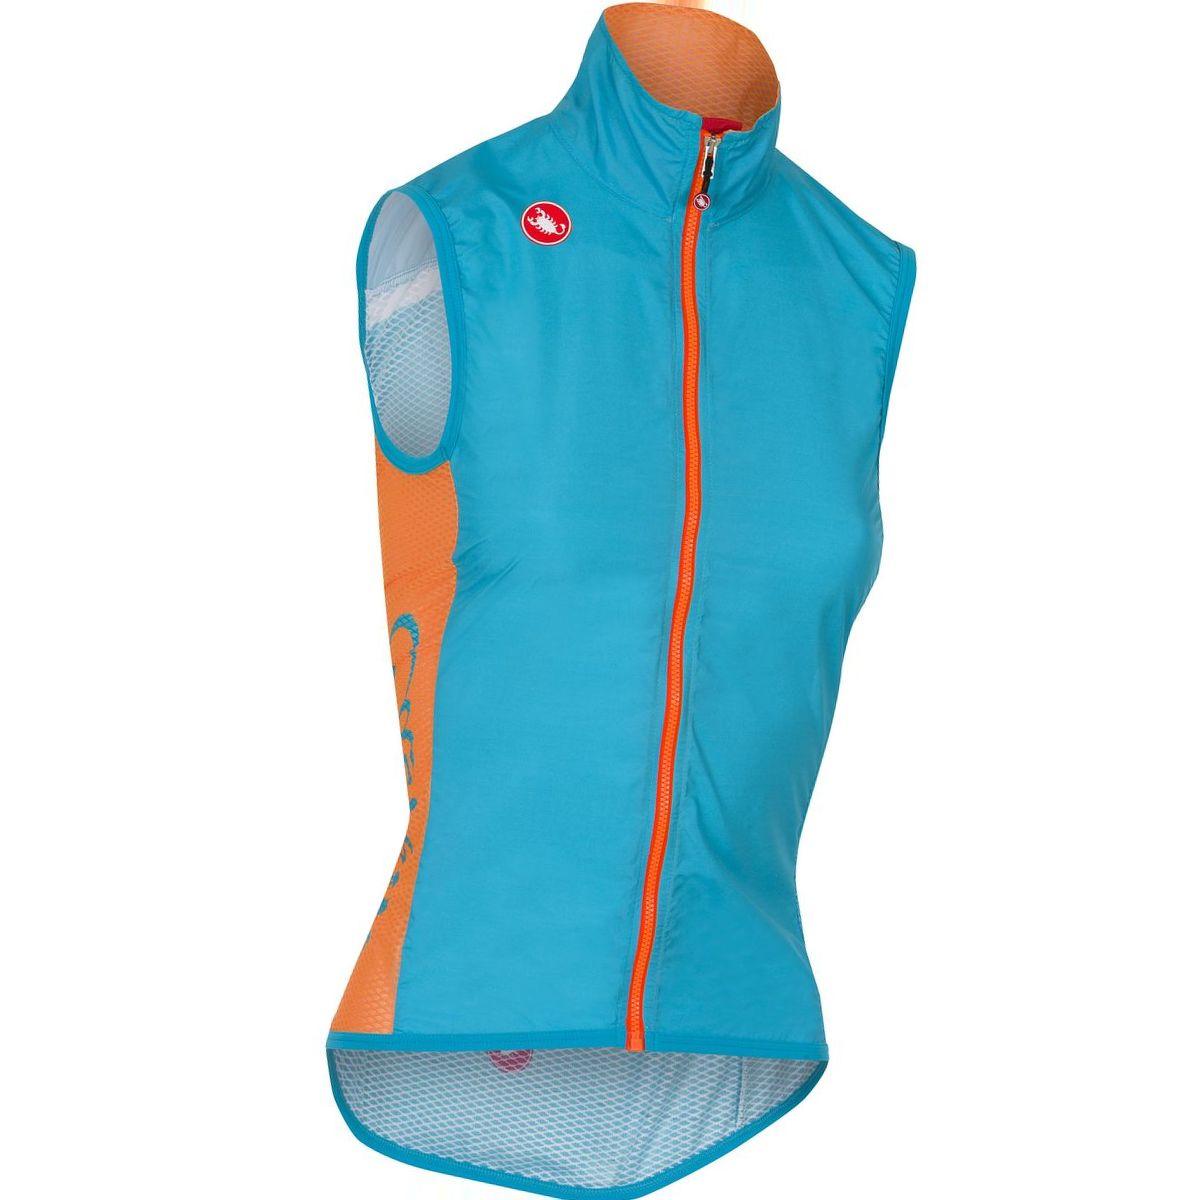 Castelli Pro Light Wind Vest - Women's